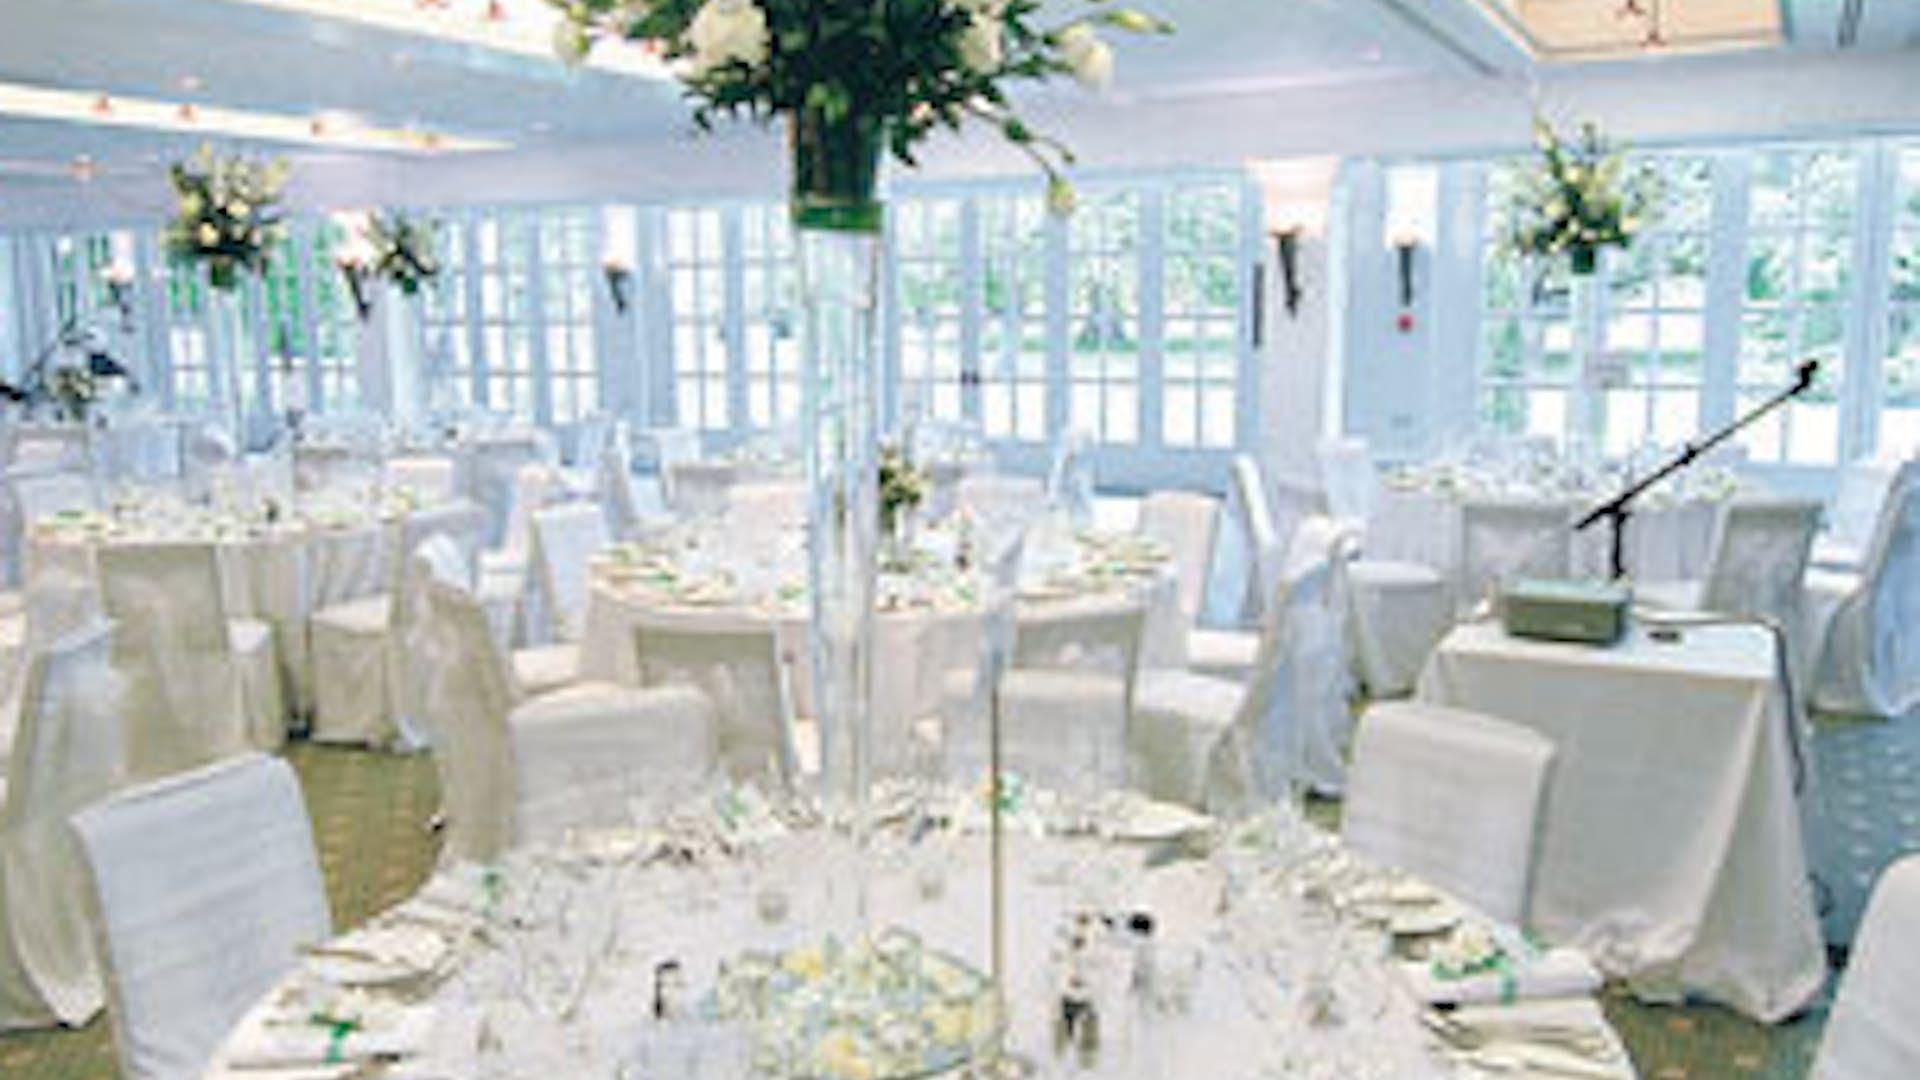 The garden room weddings hire hampton court palace for Garden rooms b q